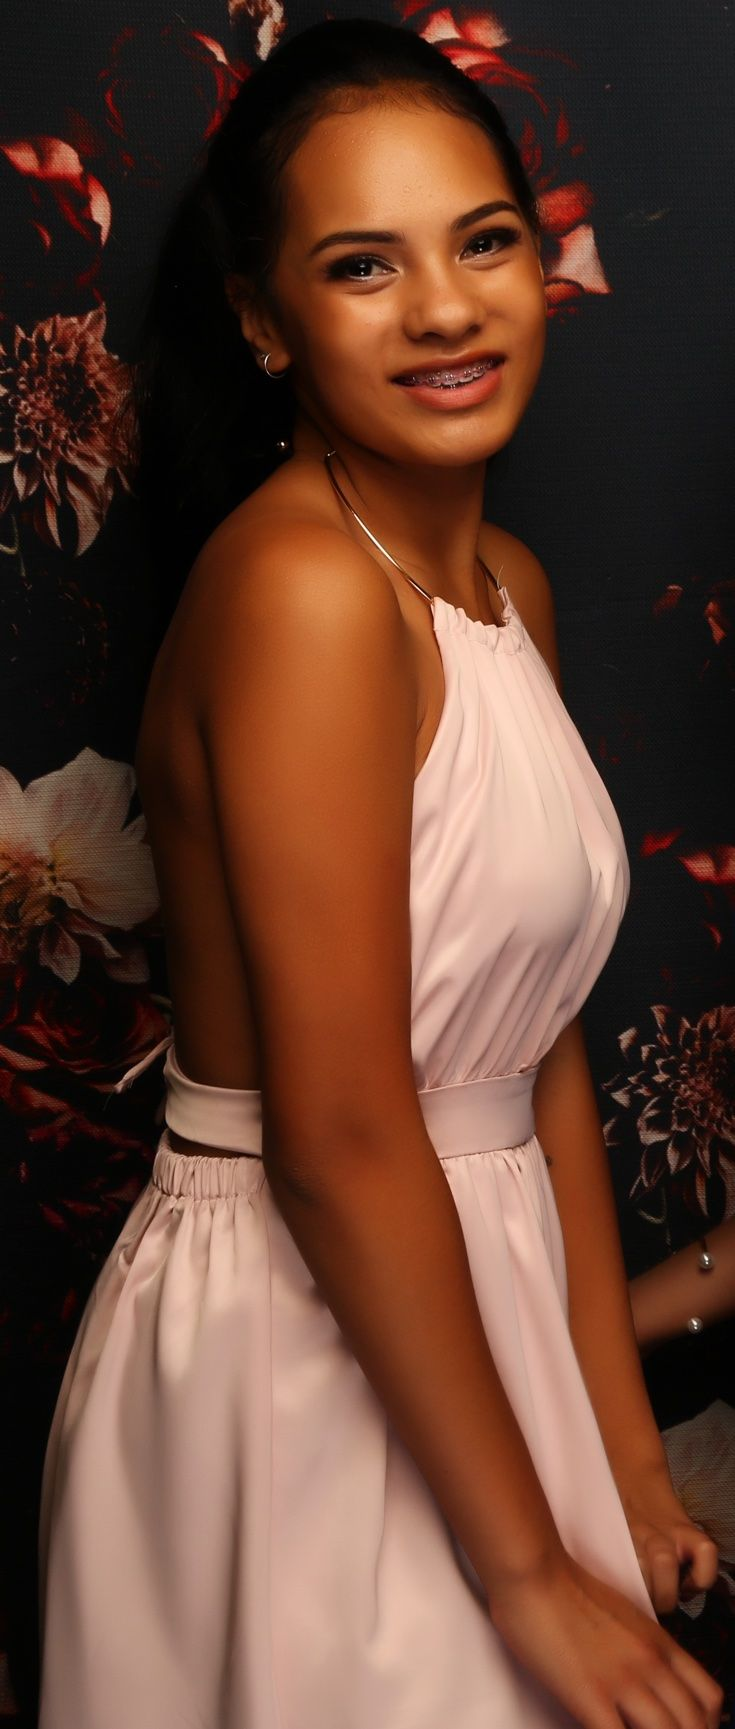 Auckland Girls Grammar Ball 2016. Adore the neckline of this gown! www.whitedoor.co.nz